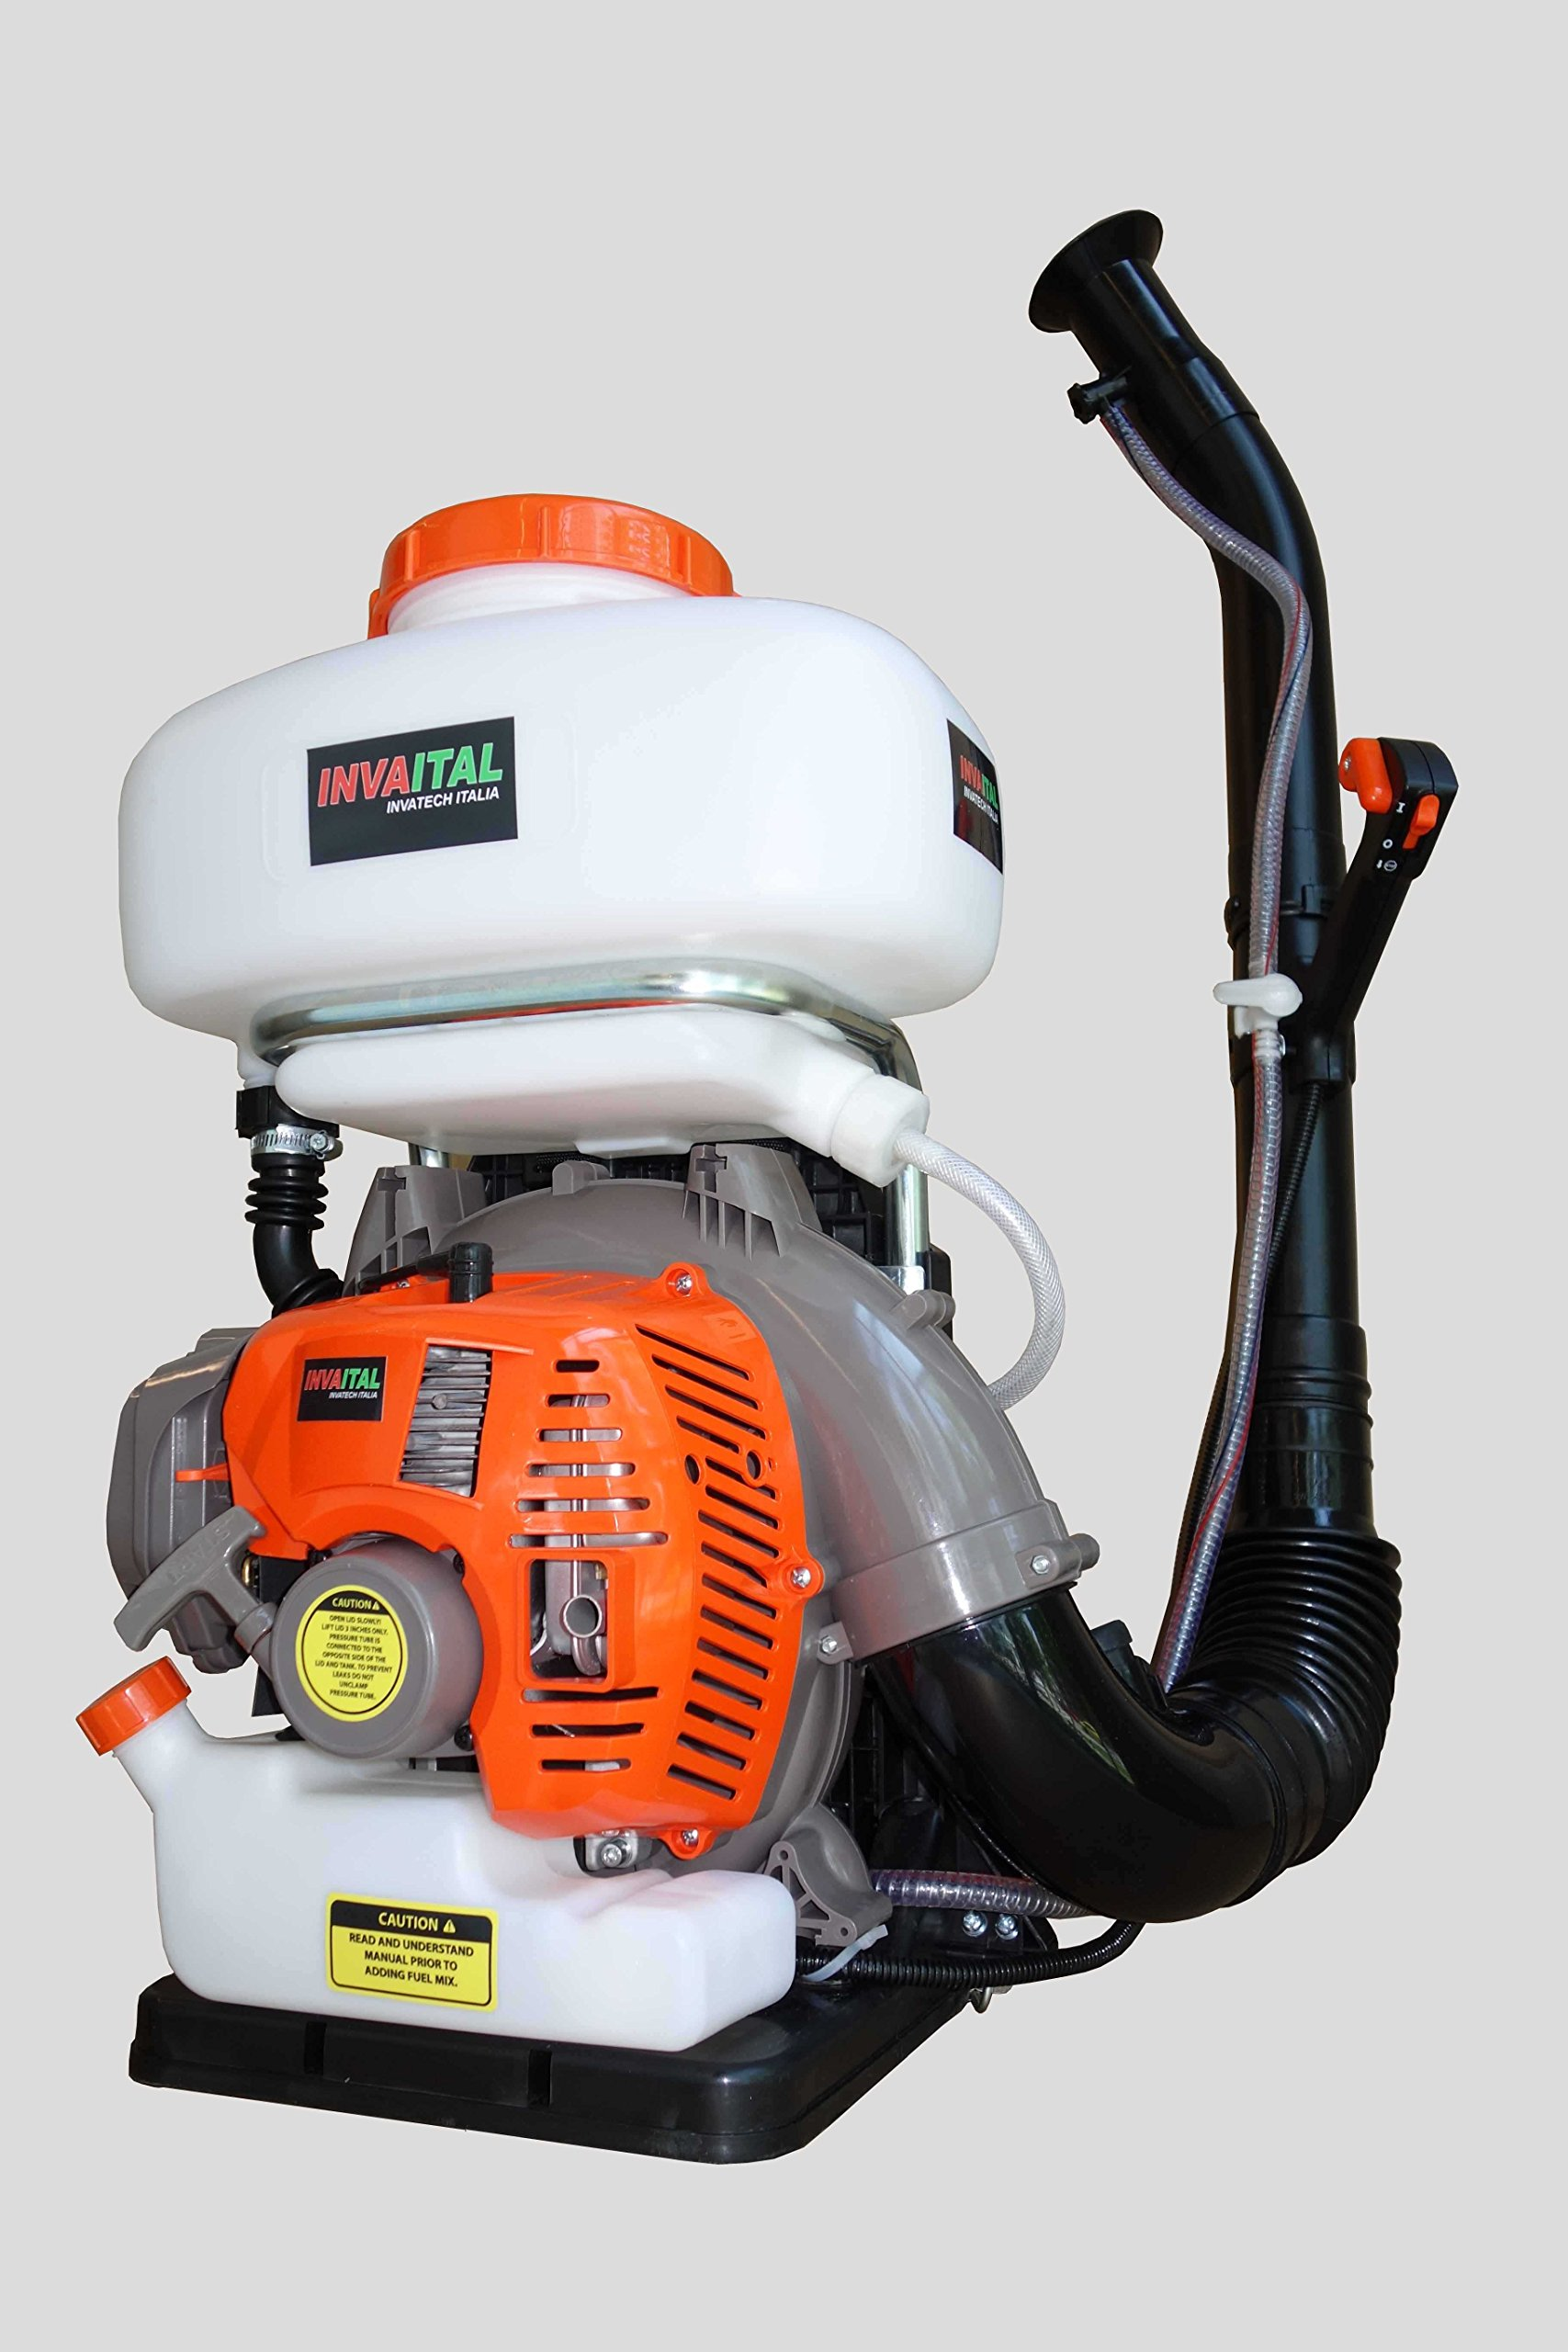 Invatech Italia New Model: 868 Mister Duster Mosquito Sprayer Mosquito Fogger Backpack Sprayer Cold Fogger